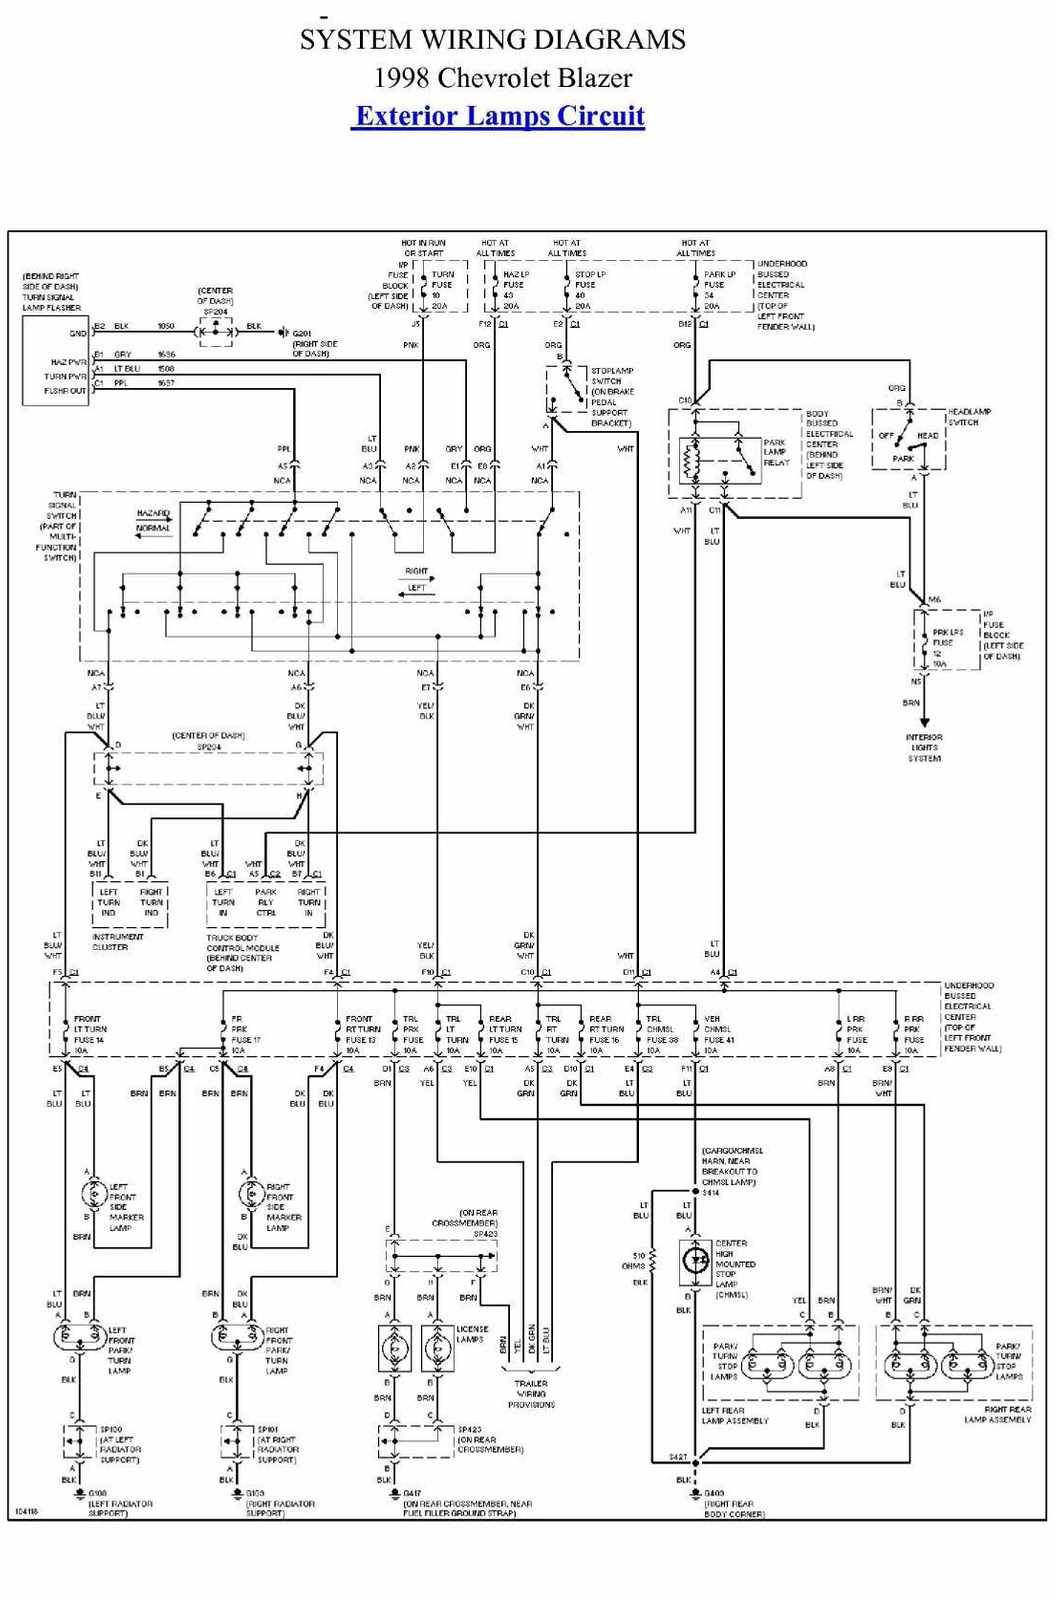 1985 K5 Blazer Fuse Panel Wiring Diagram 1963 Impala Turn Signal 93 Box Ssr Elsavadorla